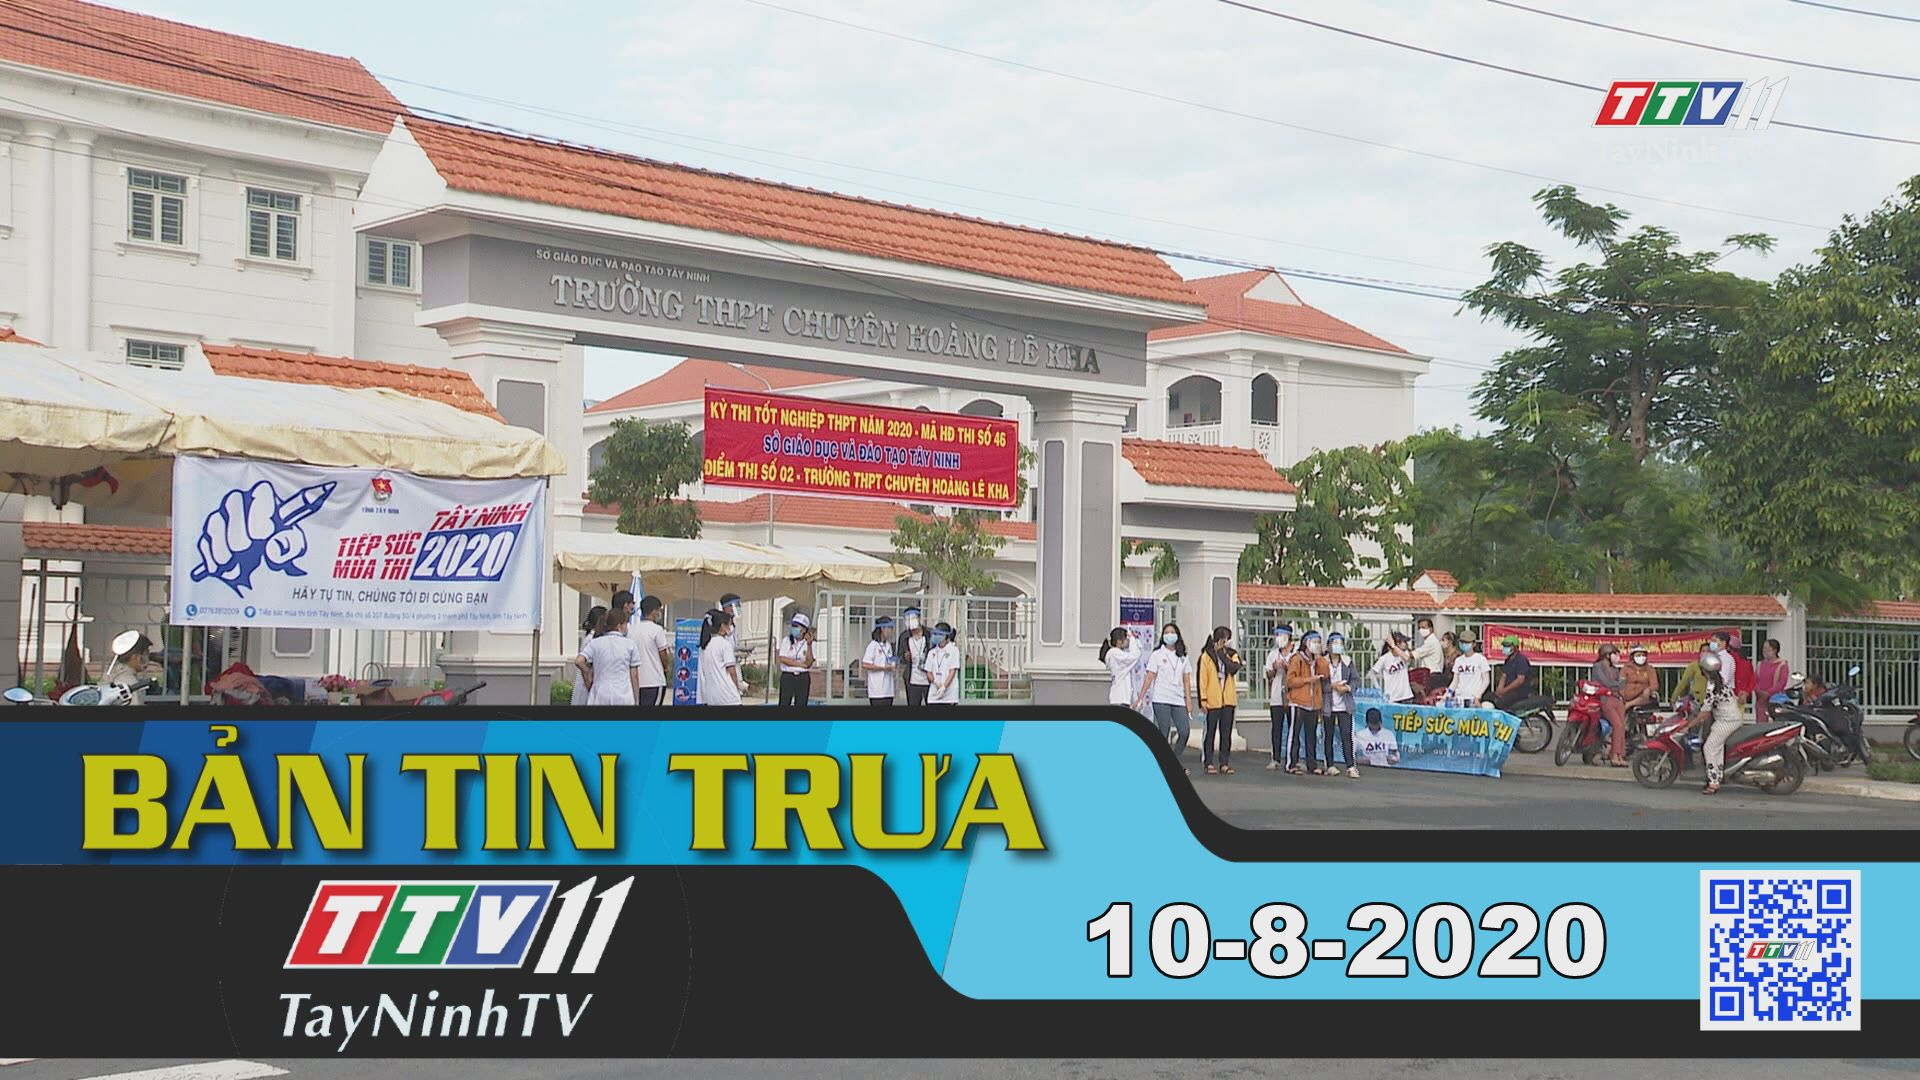 Bản tin trưa 10-8-2020 | Tin tức hôm nay | TayNinhTV